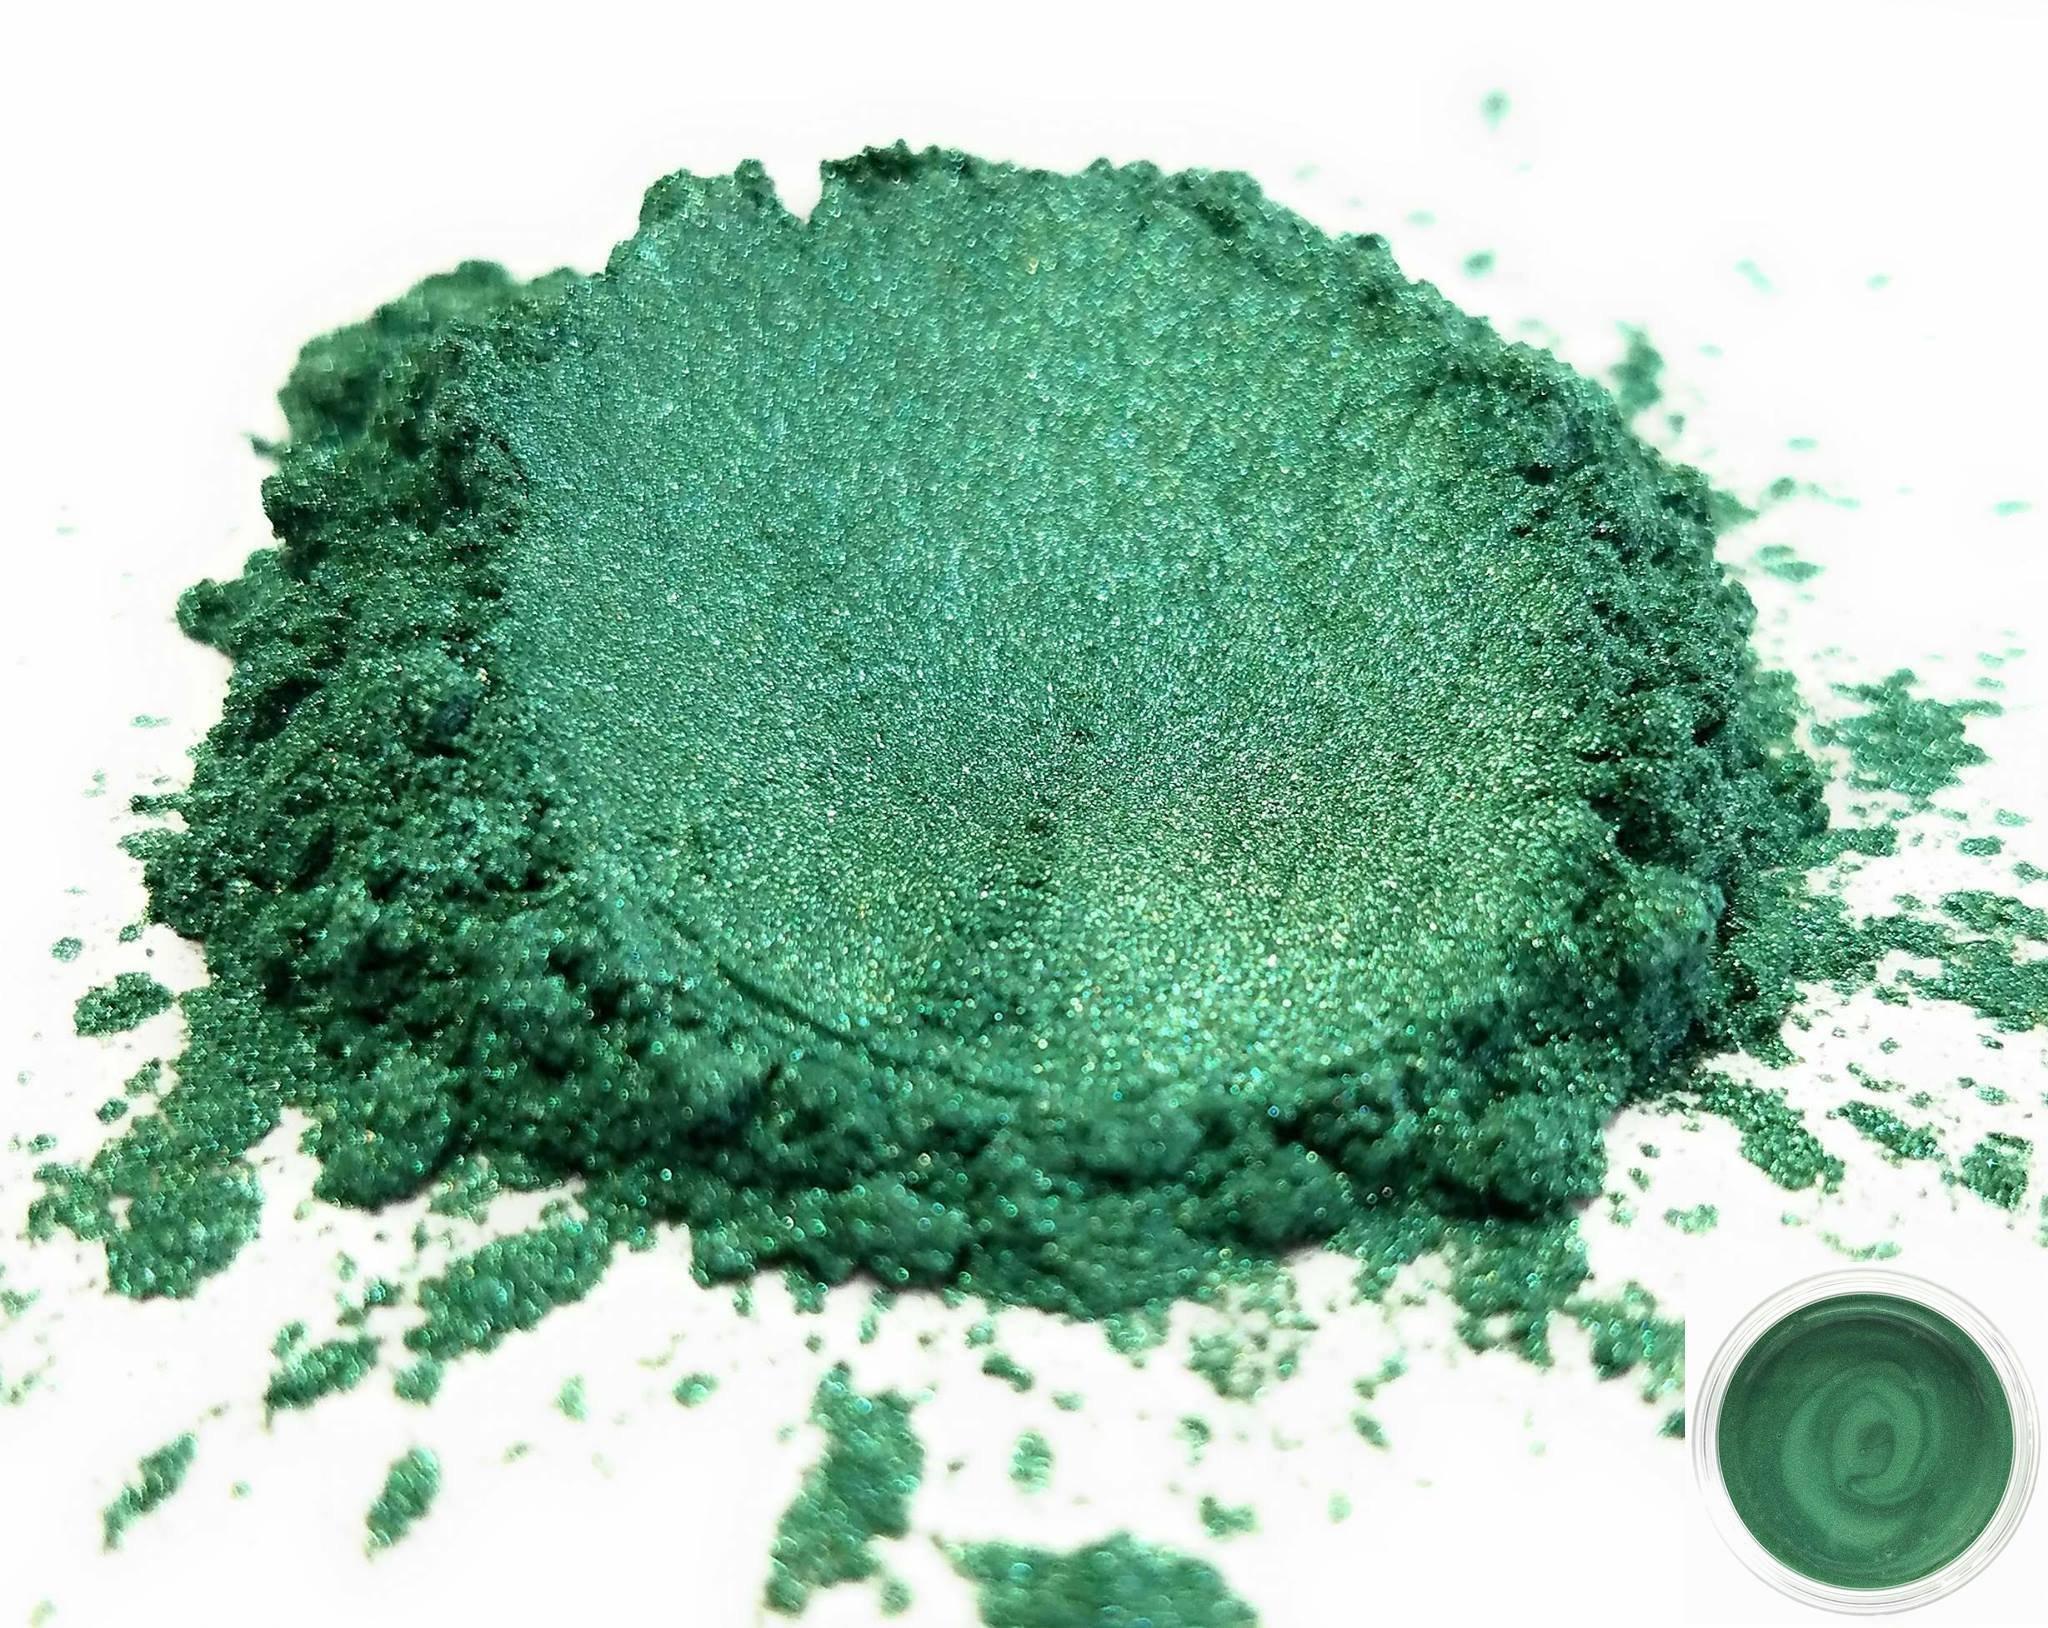 50gr ''Nori Green'' Mica Powder Pigments (Resin, Paint, Epoxy, Soaps, Nail Polish, Liquid Wraps)